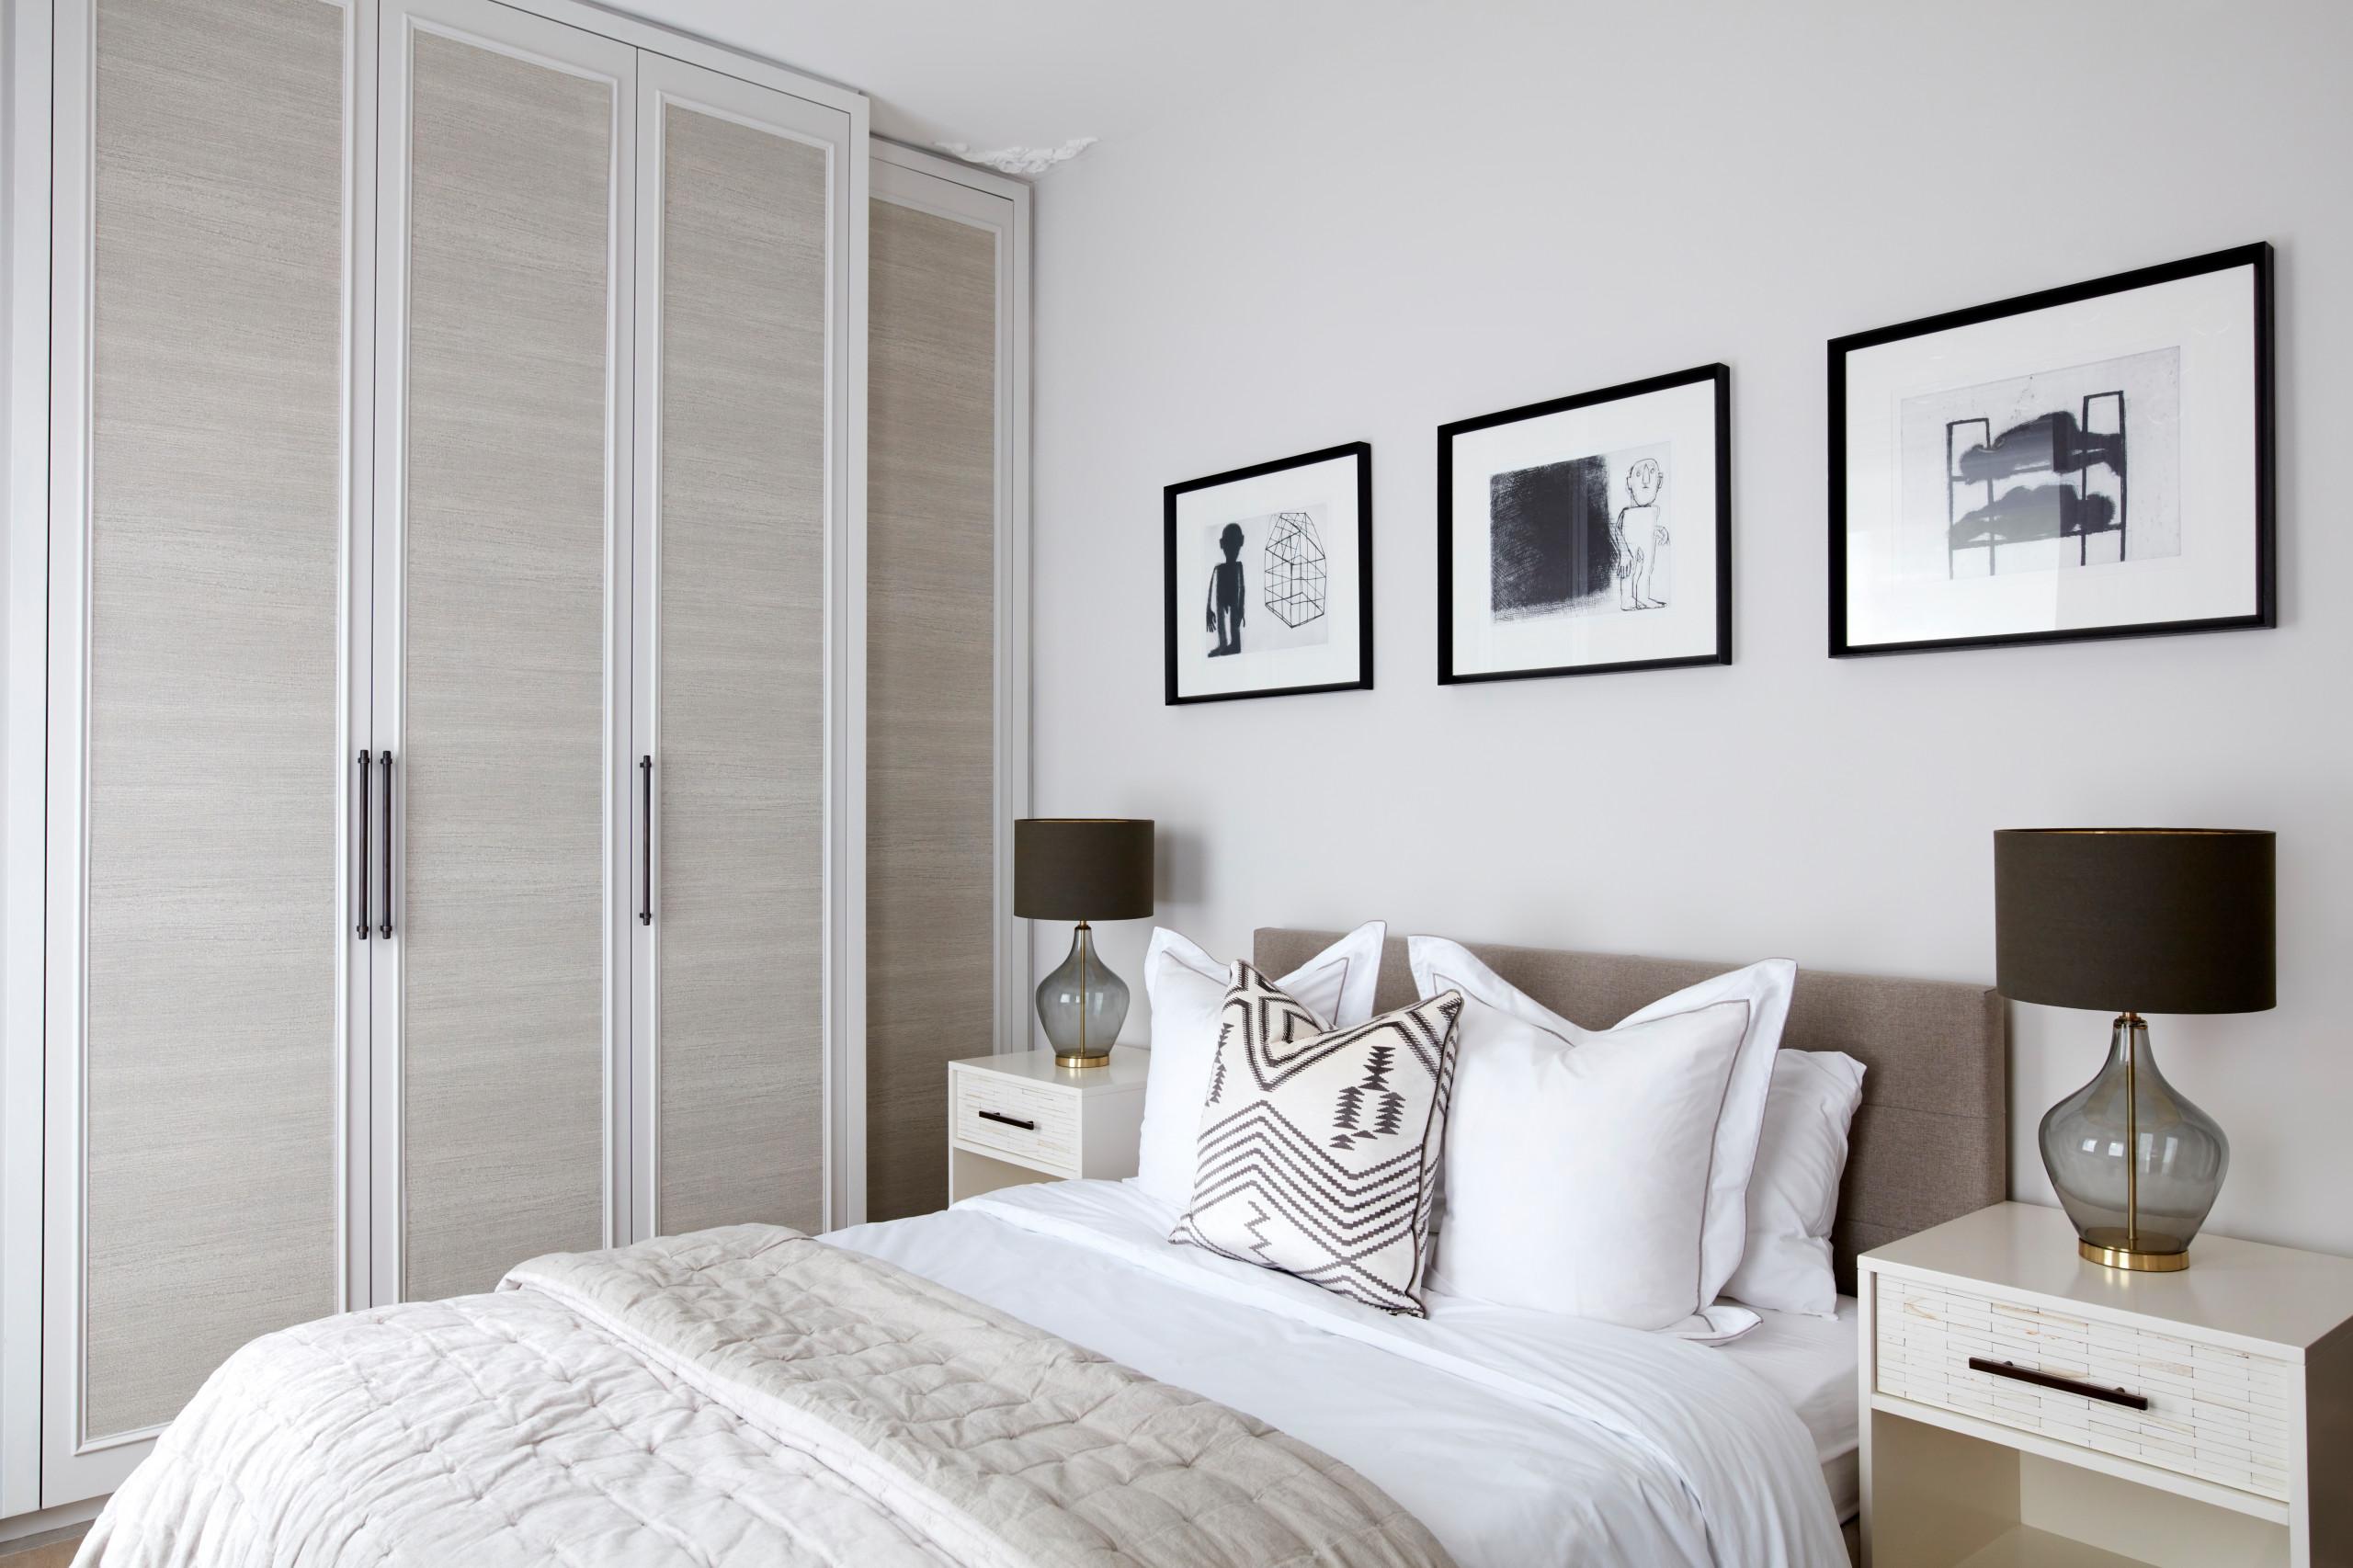 9 x 12 bedroom ideas & photos | houzz